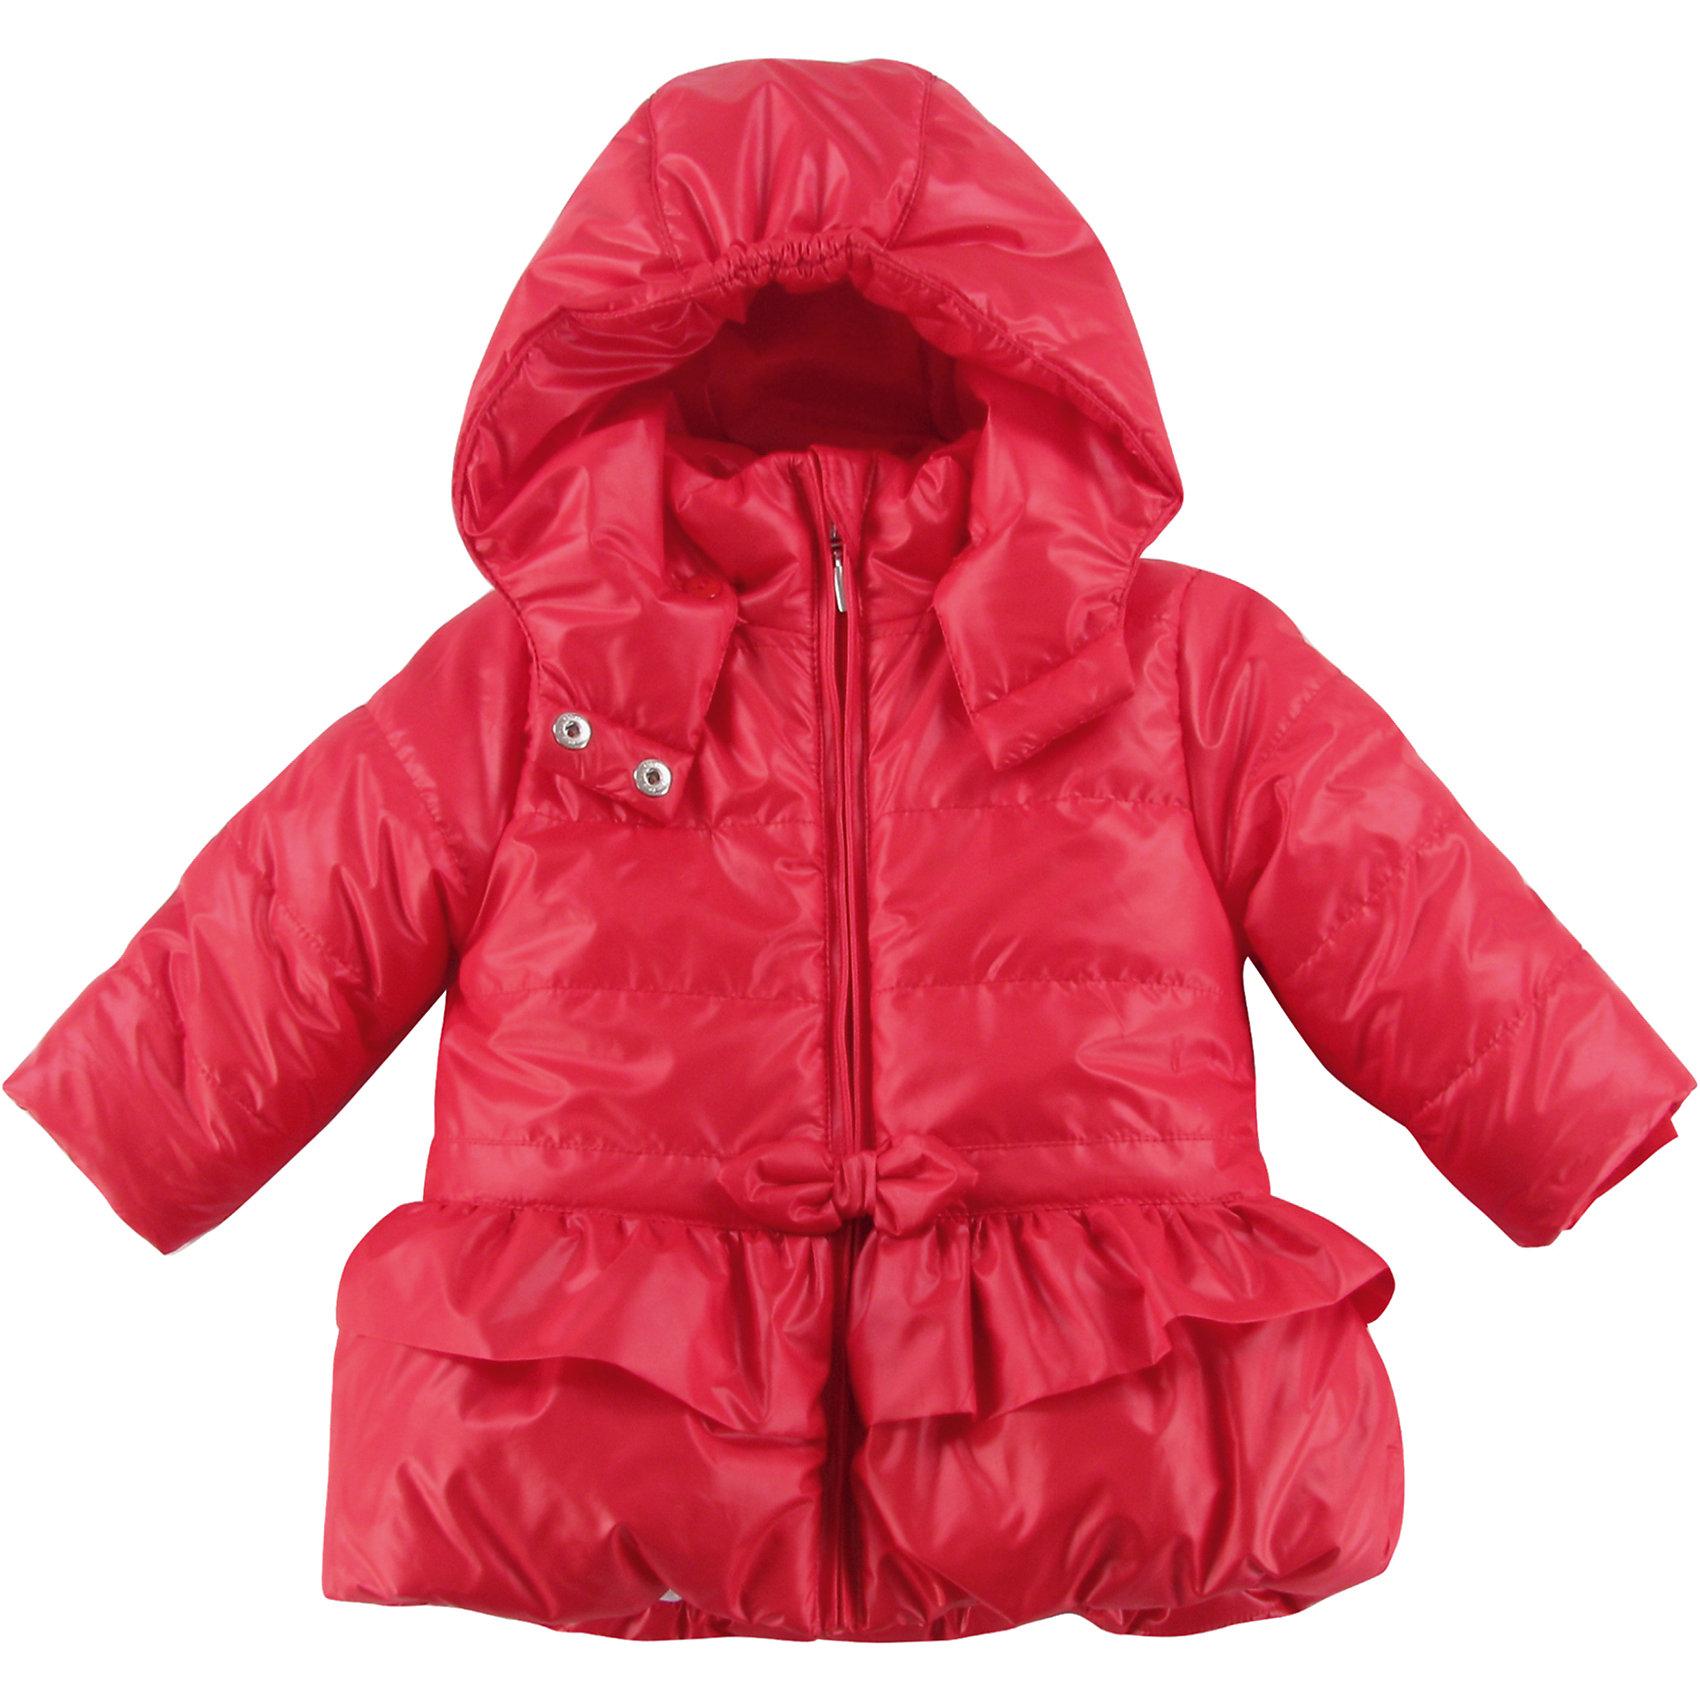 Куртка утепленная для девочки WojcikВерхняя одежда<br>Куртка утепленная для девочки Wojcik<br>Состав:<br>Полиэстер 100%<br><br>Ширина мм: 356<br>Глубина мм: 10<br>Высота мм: 245<br>Вес г: 519<br>Цвет: красный<br>Возраст от месяцев: 12<br>Возраст до месяцев: 18<br>Пол: Женский<br>Возраст: Детский<br>Размер: 86,92,98,74,80<br>SKU: 5590593